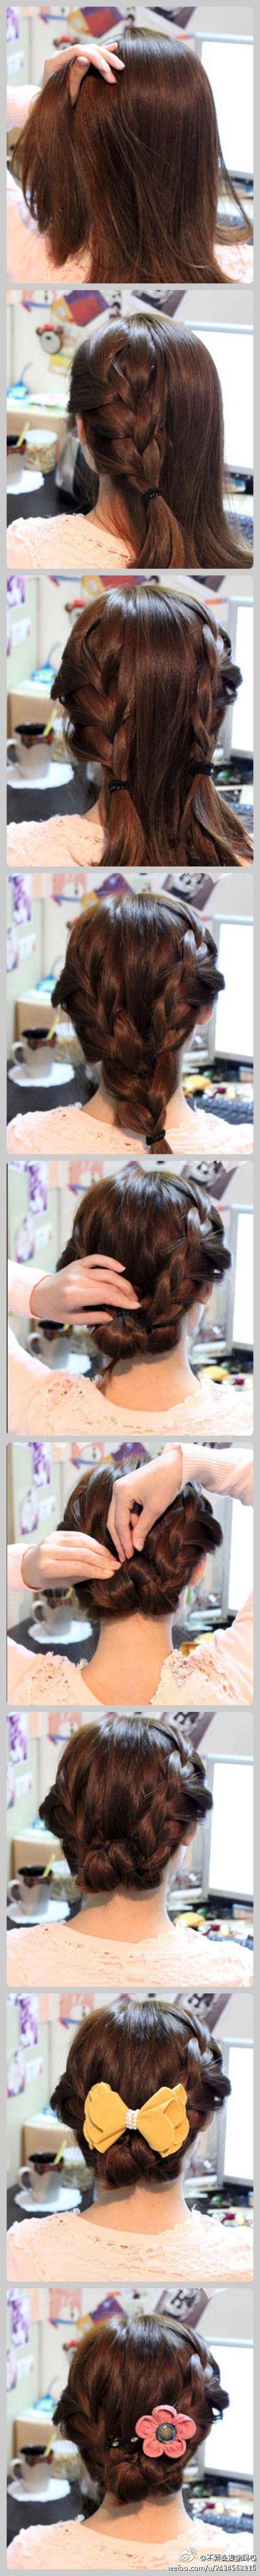 Easy braided hair